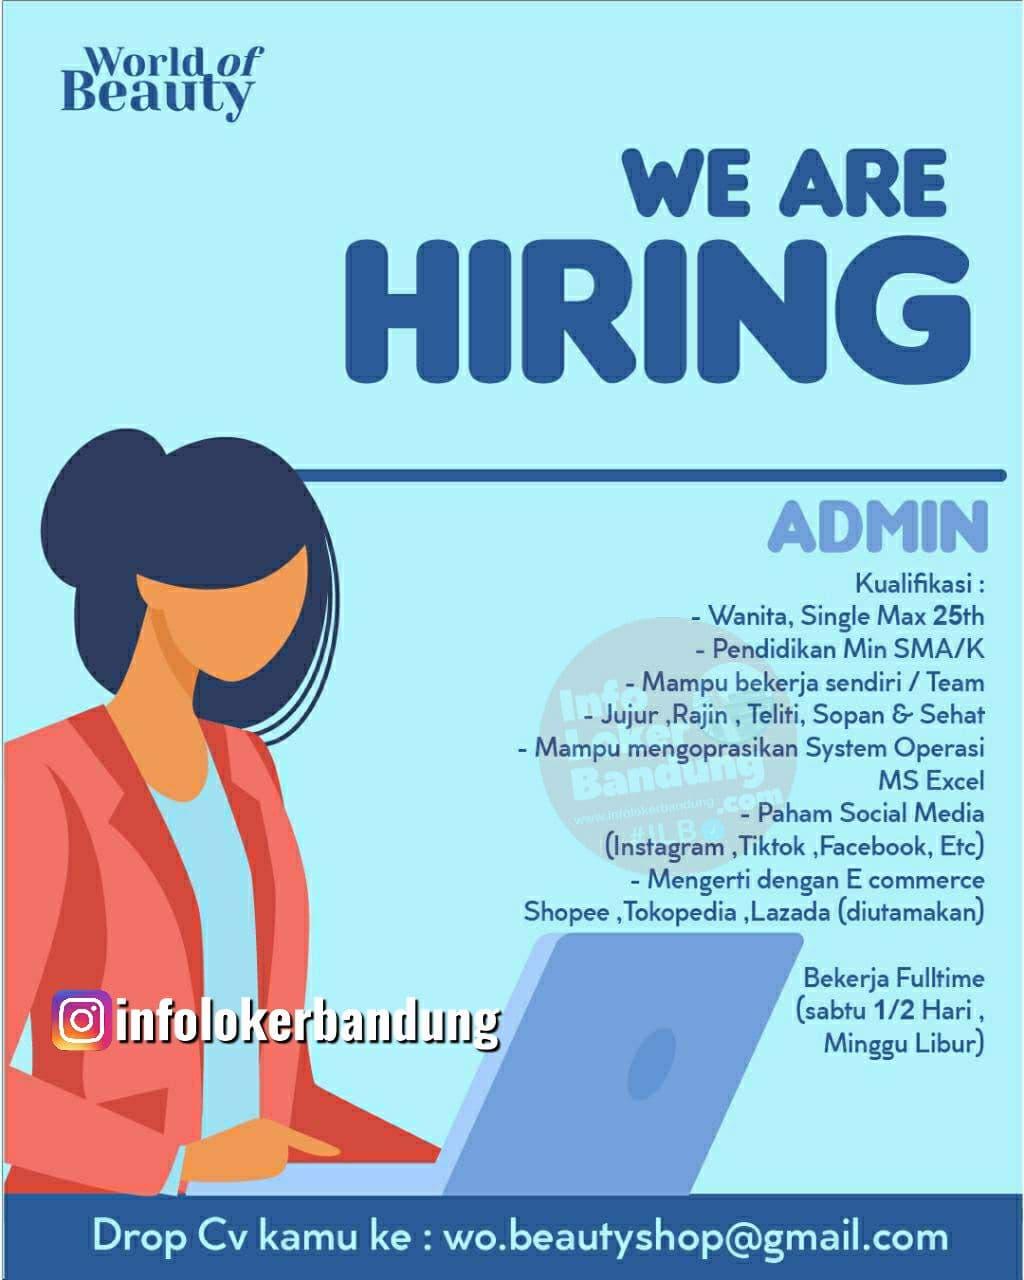 Lowongan Kerja Admin World of Beuaty Shop Bandung Juni 2021